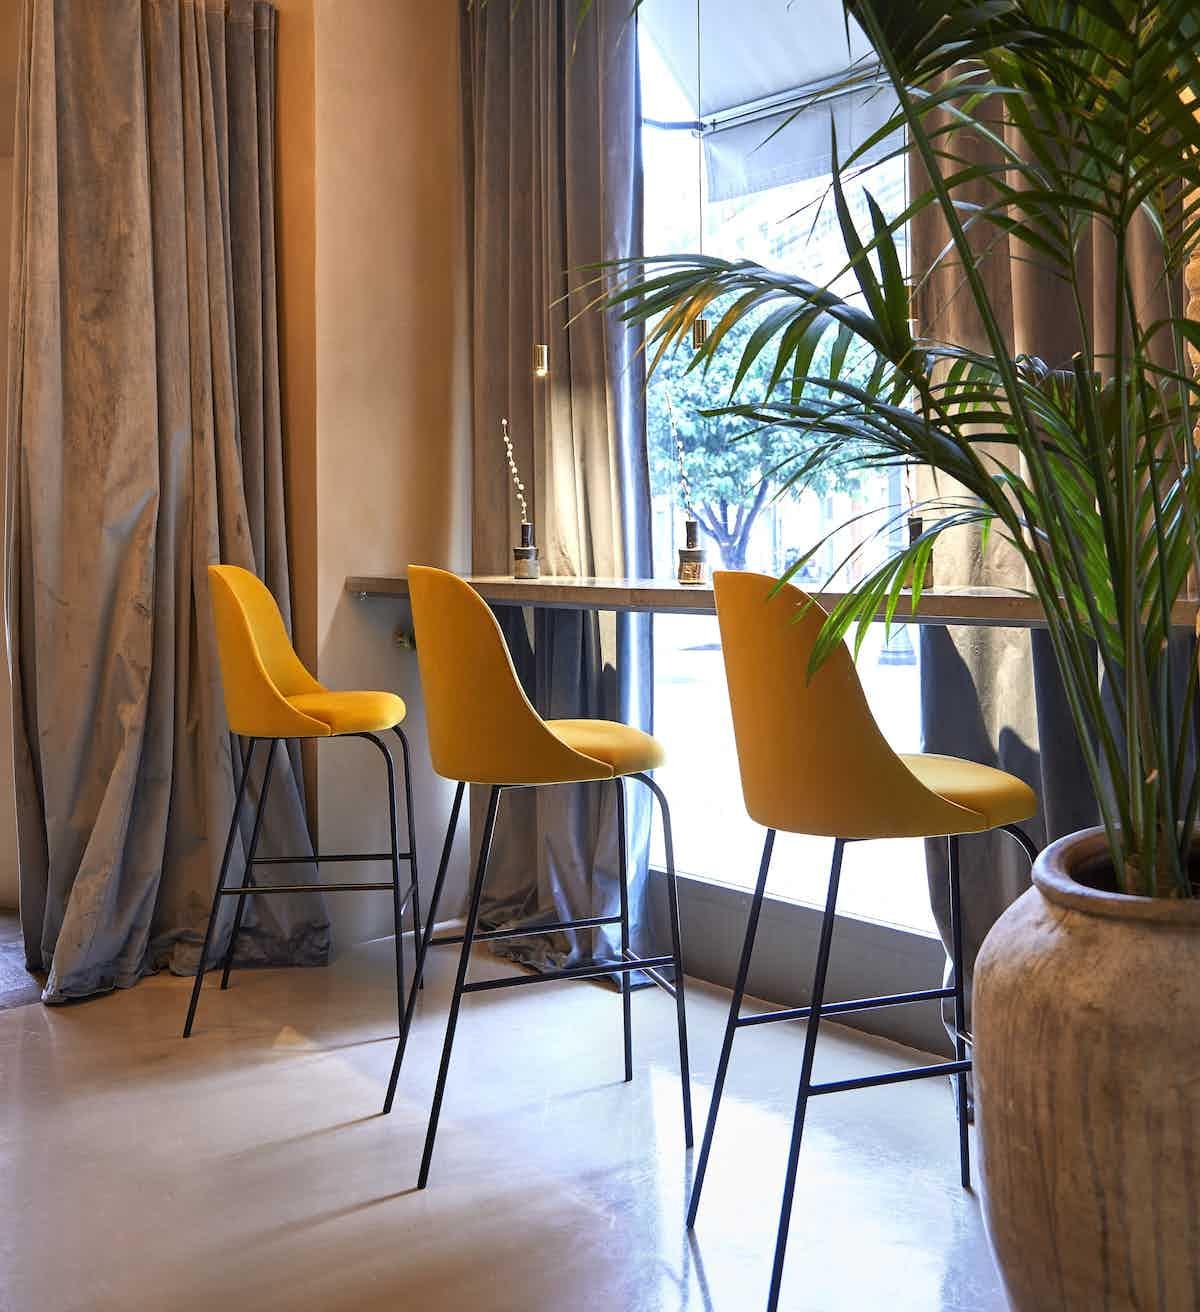 Viccarbe Aleta stool by Jaime Hayon 5